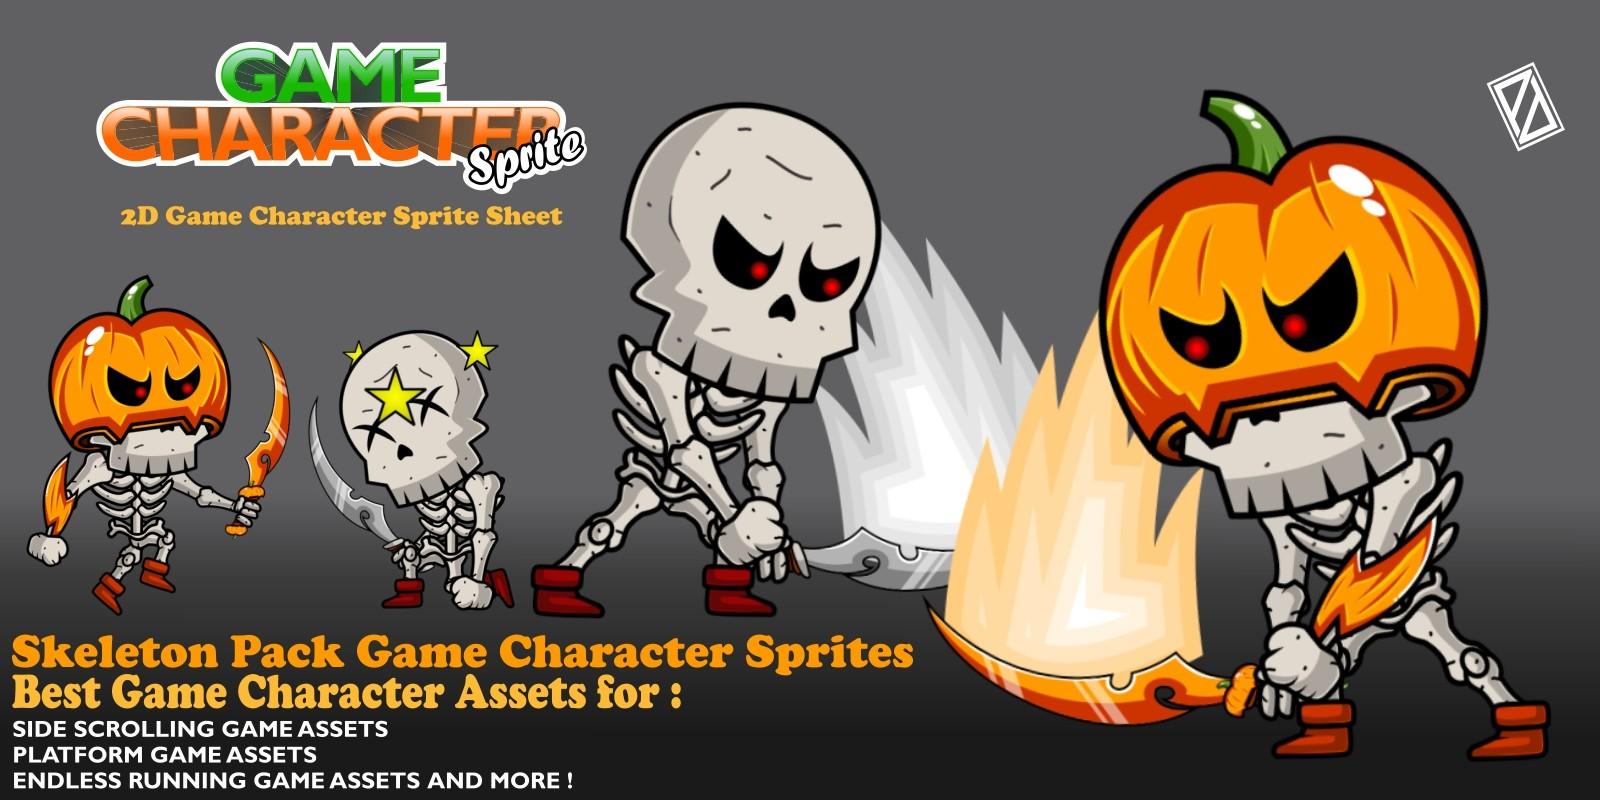 Skeleton Pack Game Character Sprite